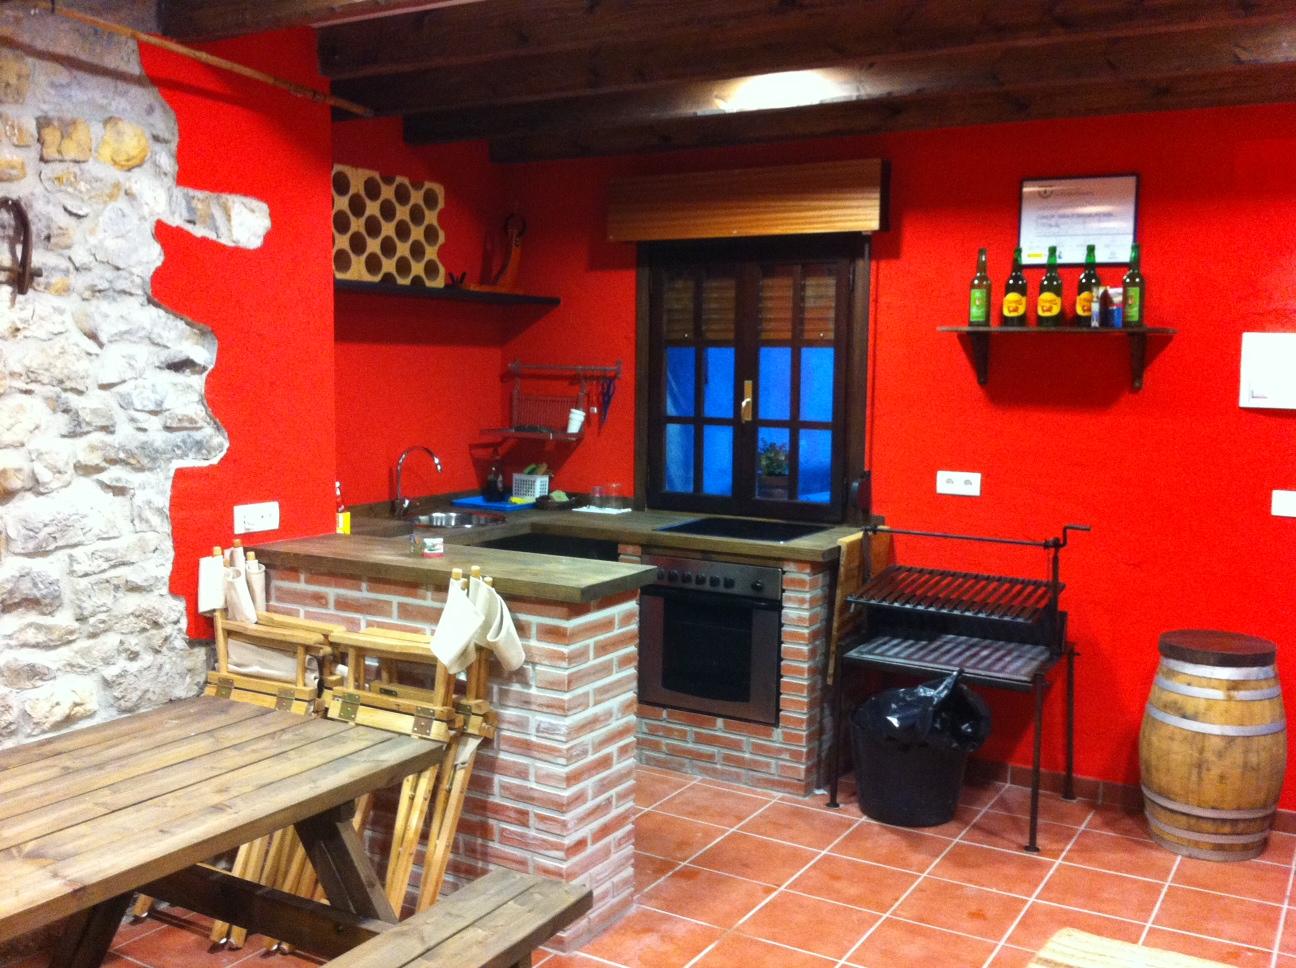 Cider cellar the kitchen cottage Asturias-Rincón de Sella